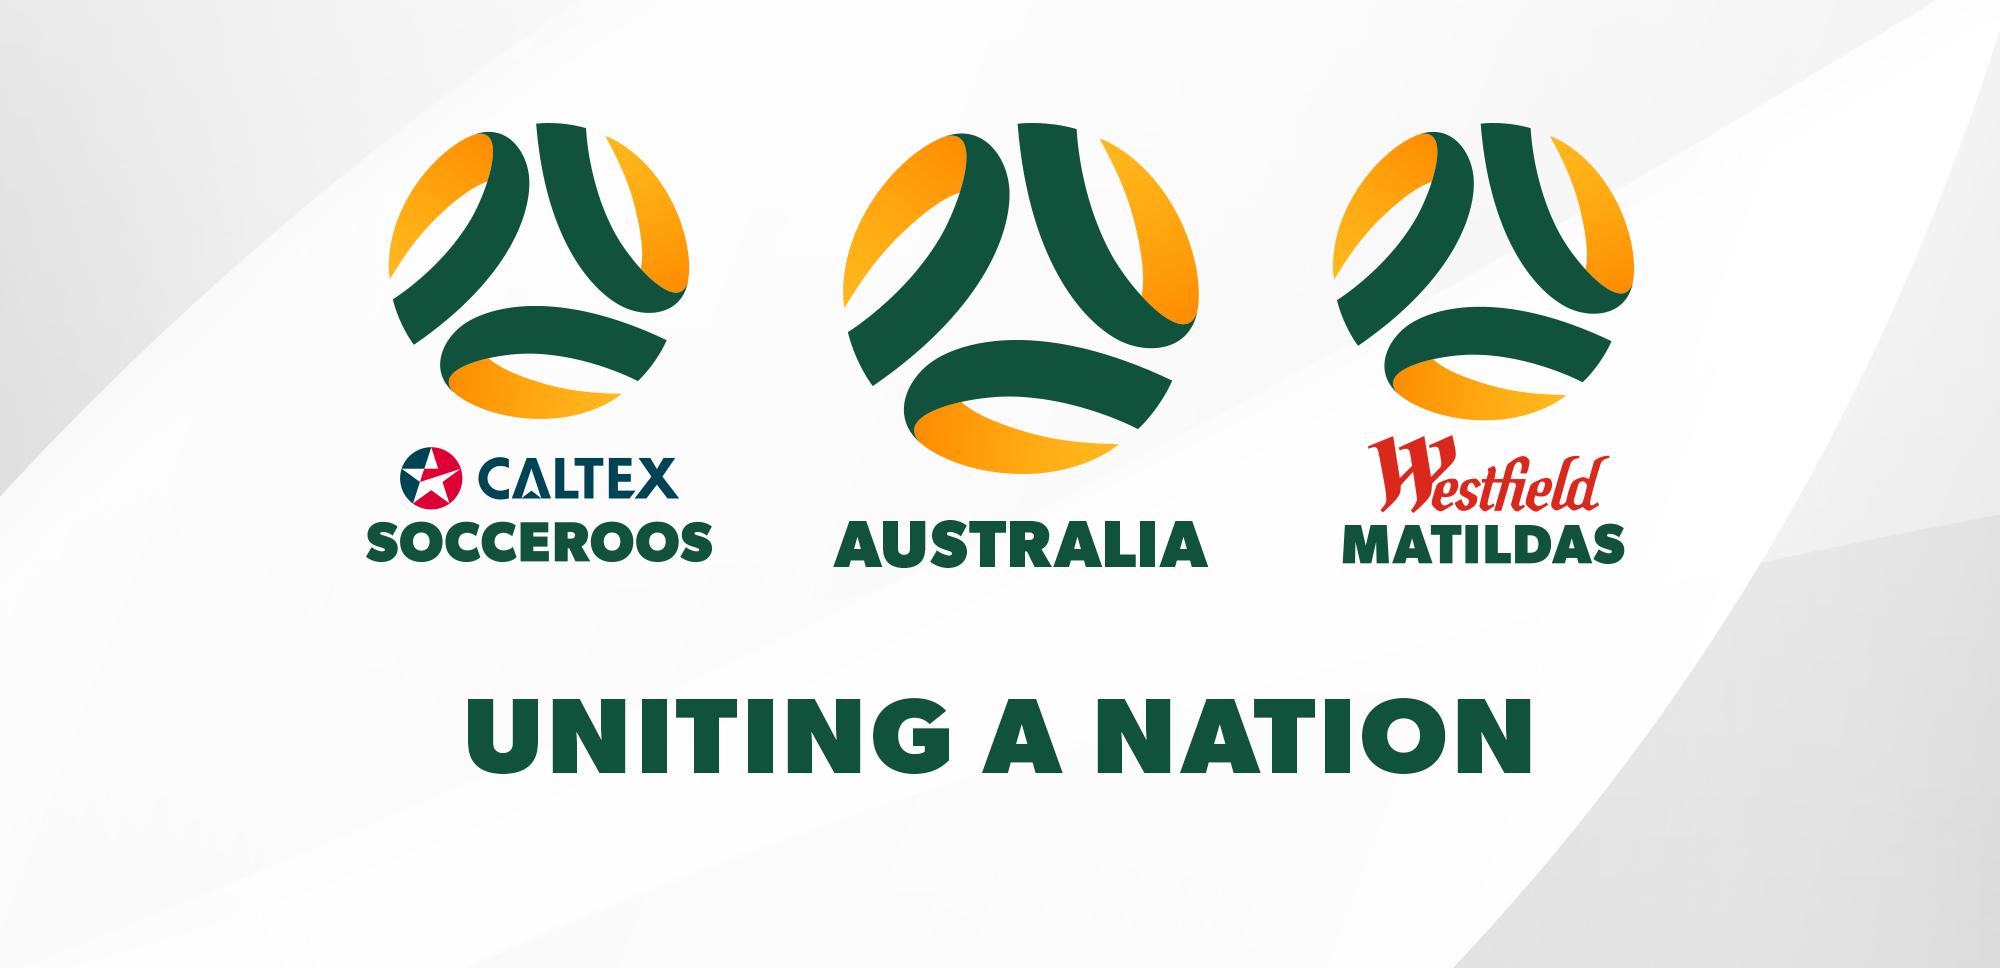 'Uniting a Nation': FFA unveils unifying brand identity ...